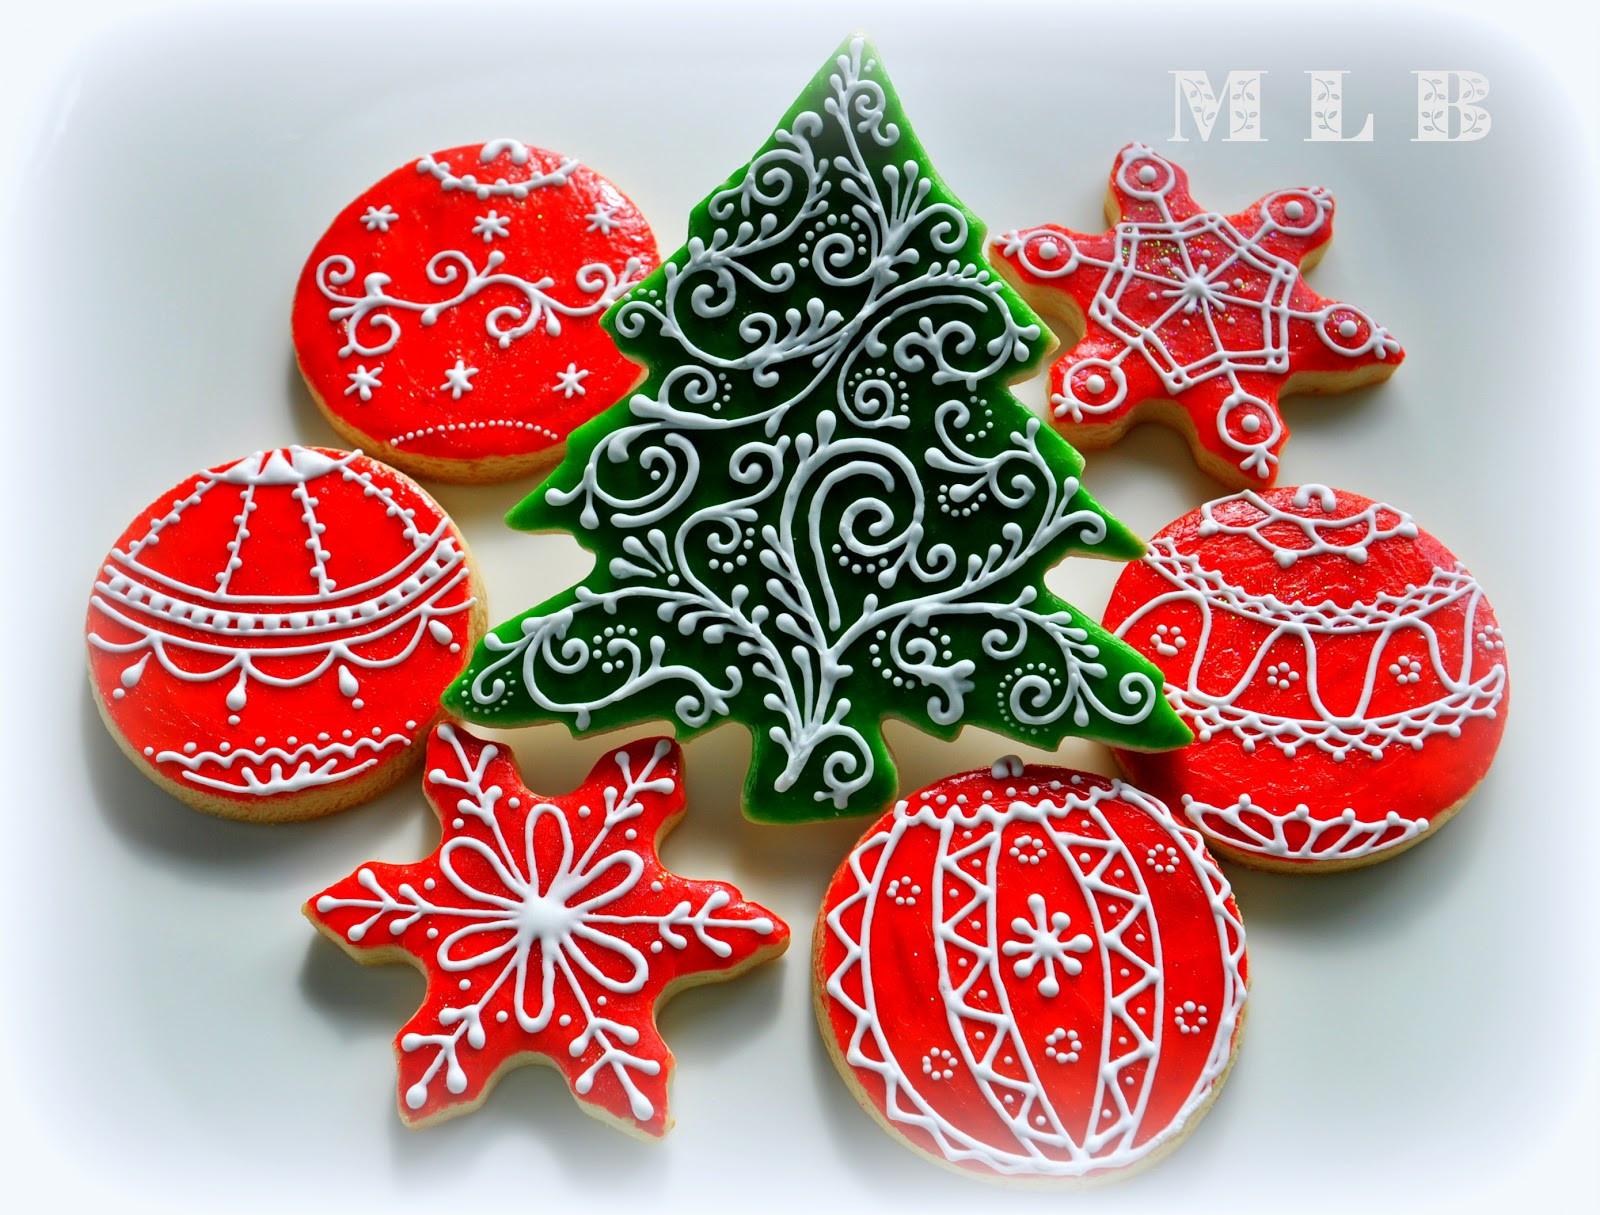 Christmas Cookies Image  My little bakery 🌹 Christmas tree cookies And polish